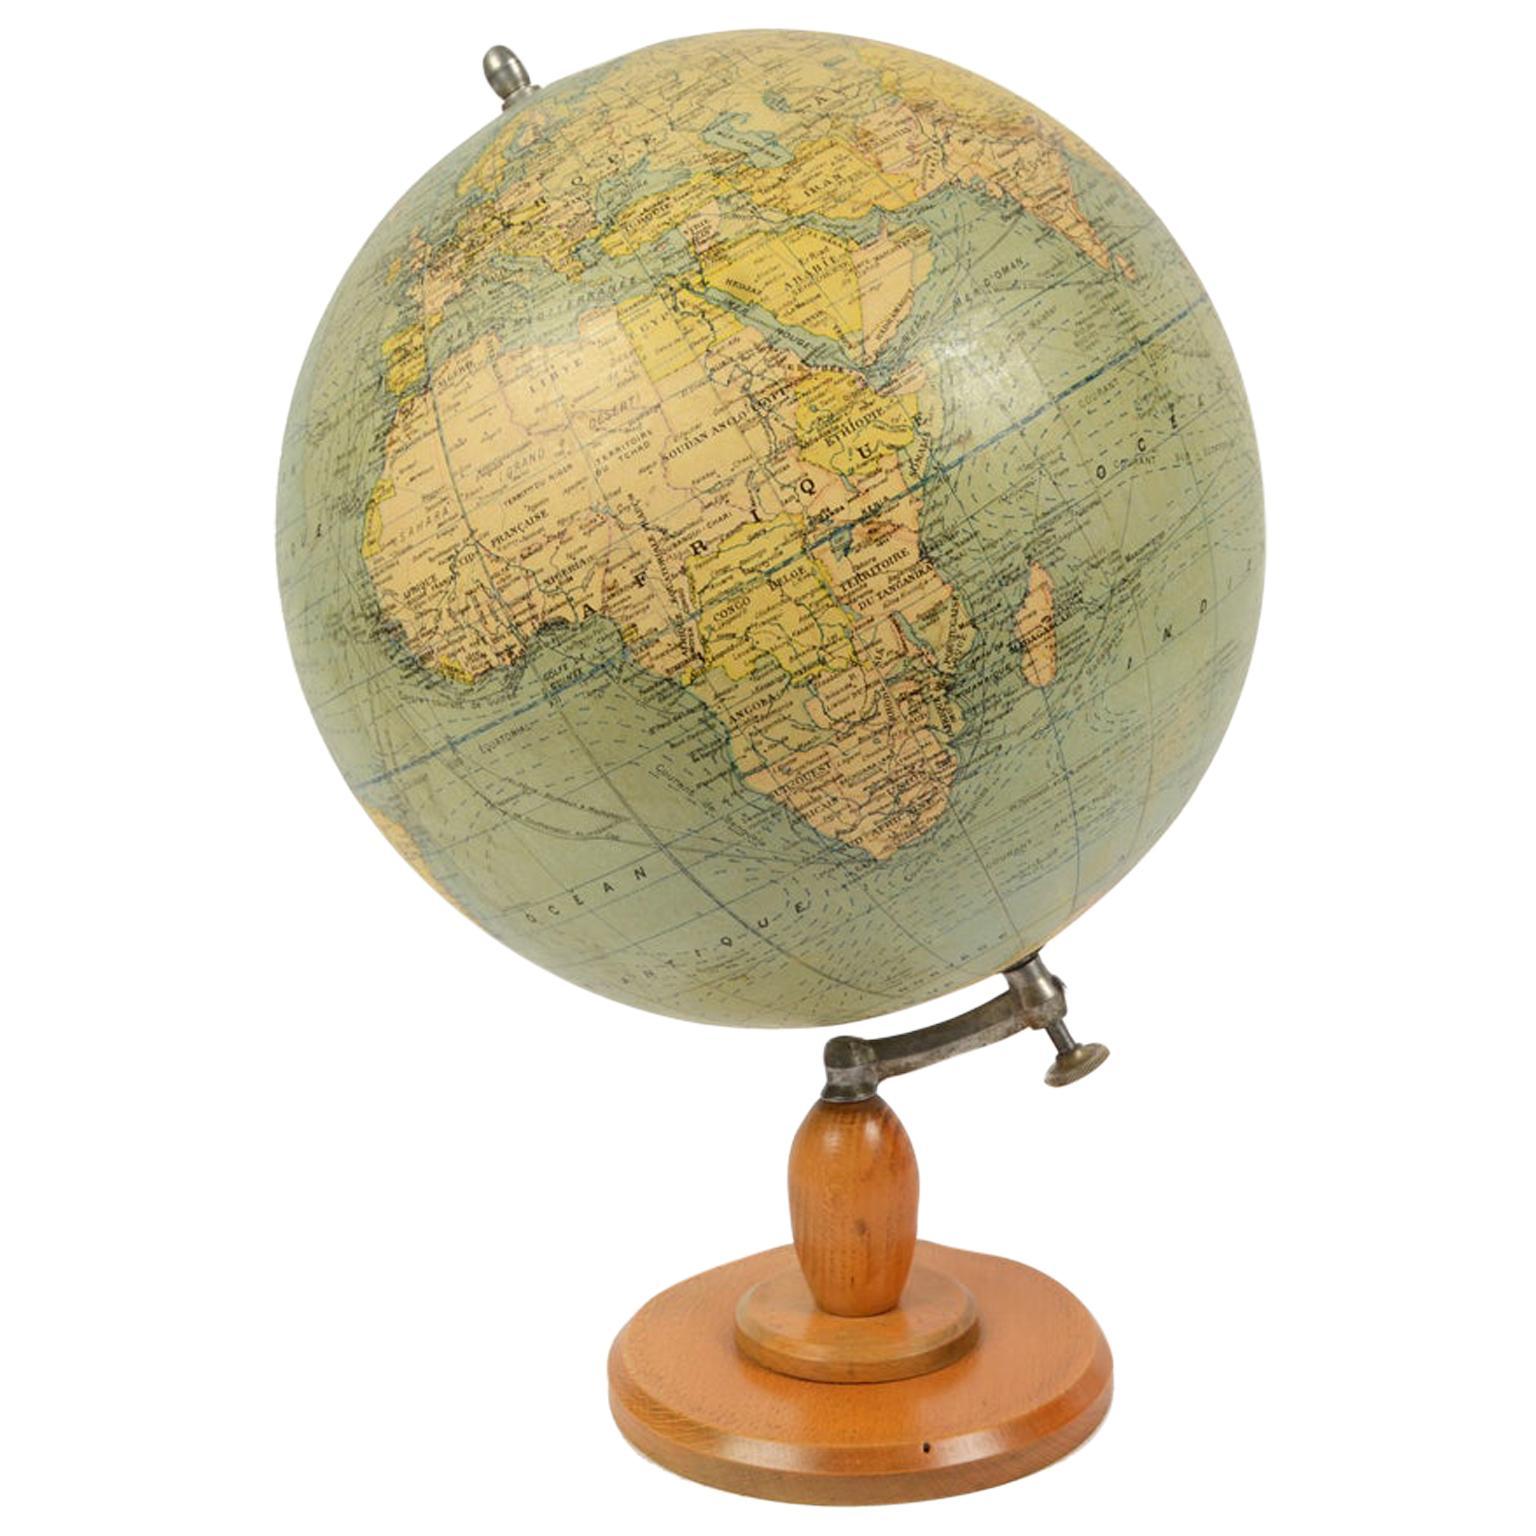 Antique Terrestrial Globe Published in 1940s by Girard Barrère et Thomas, Paris